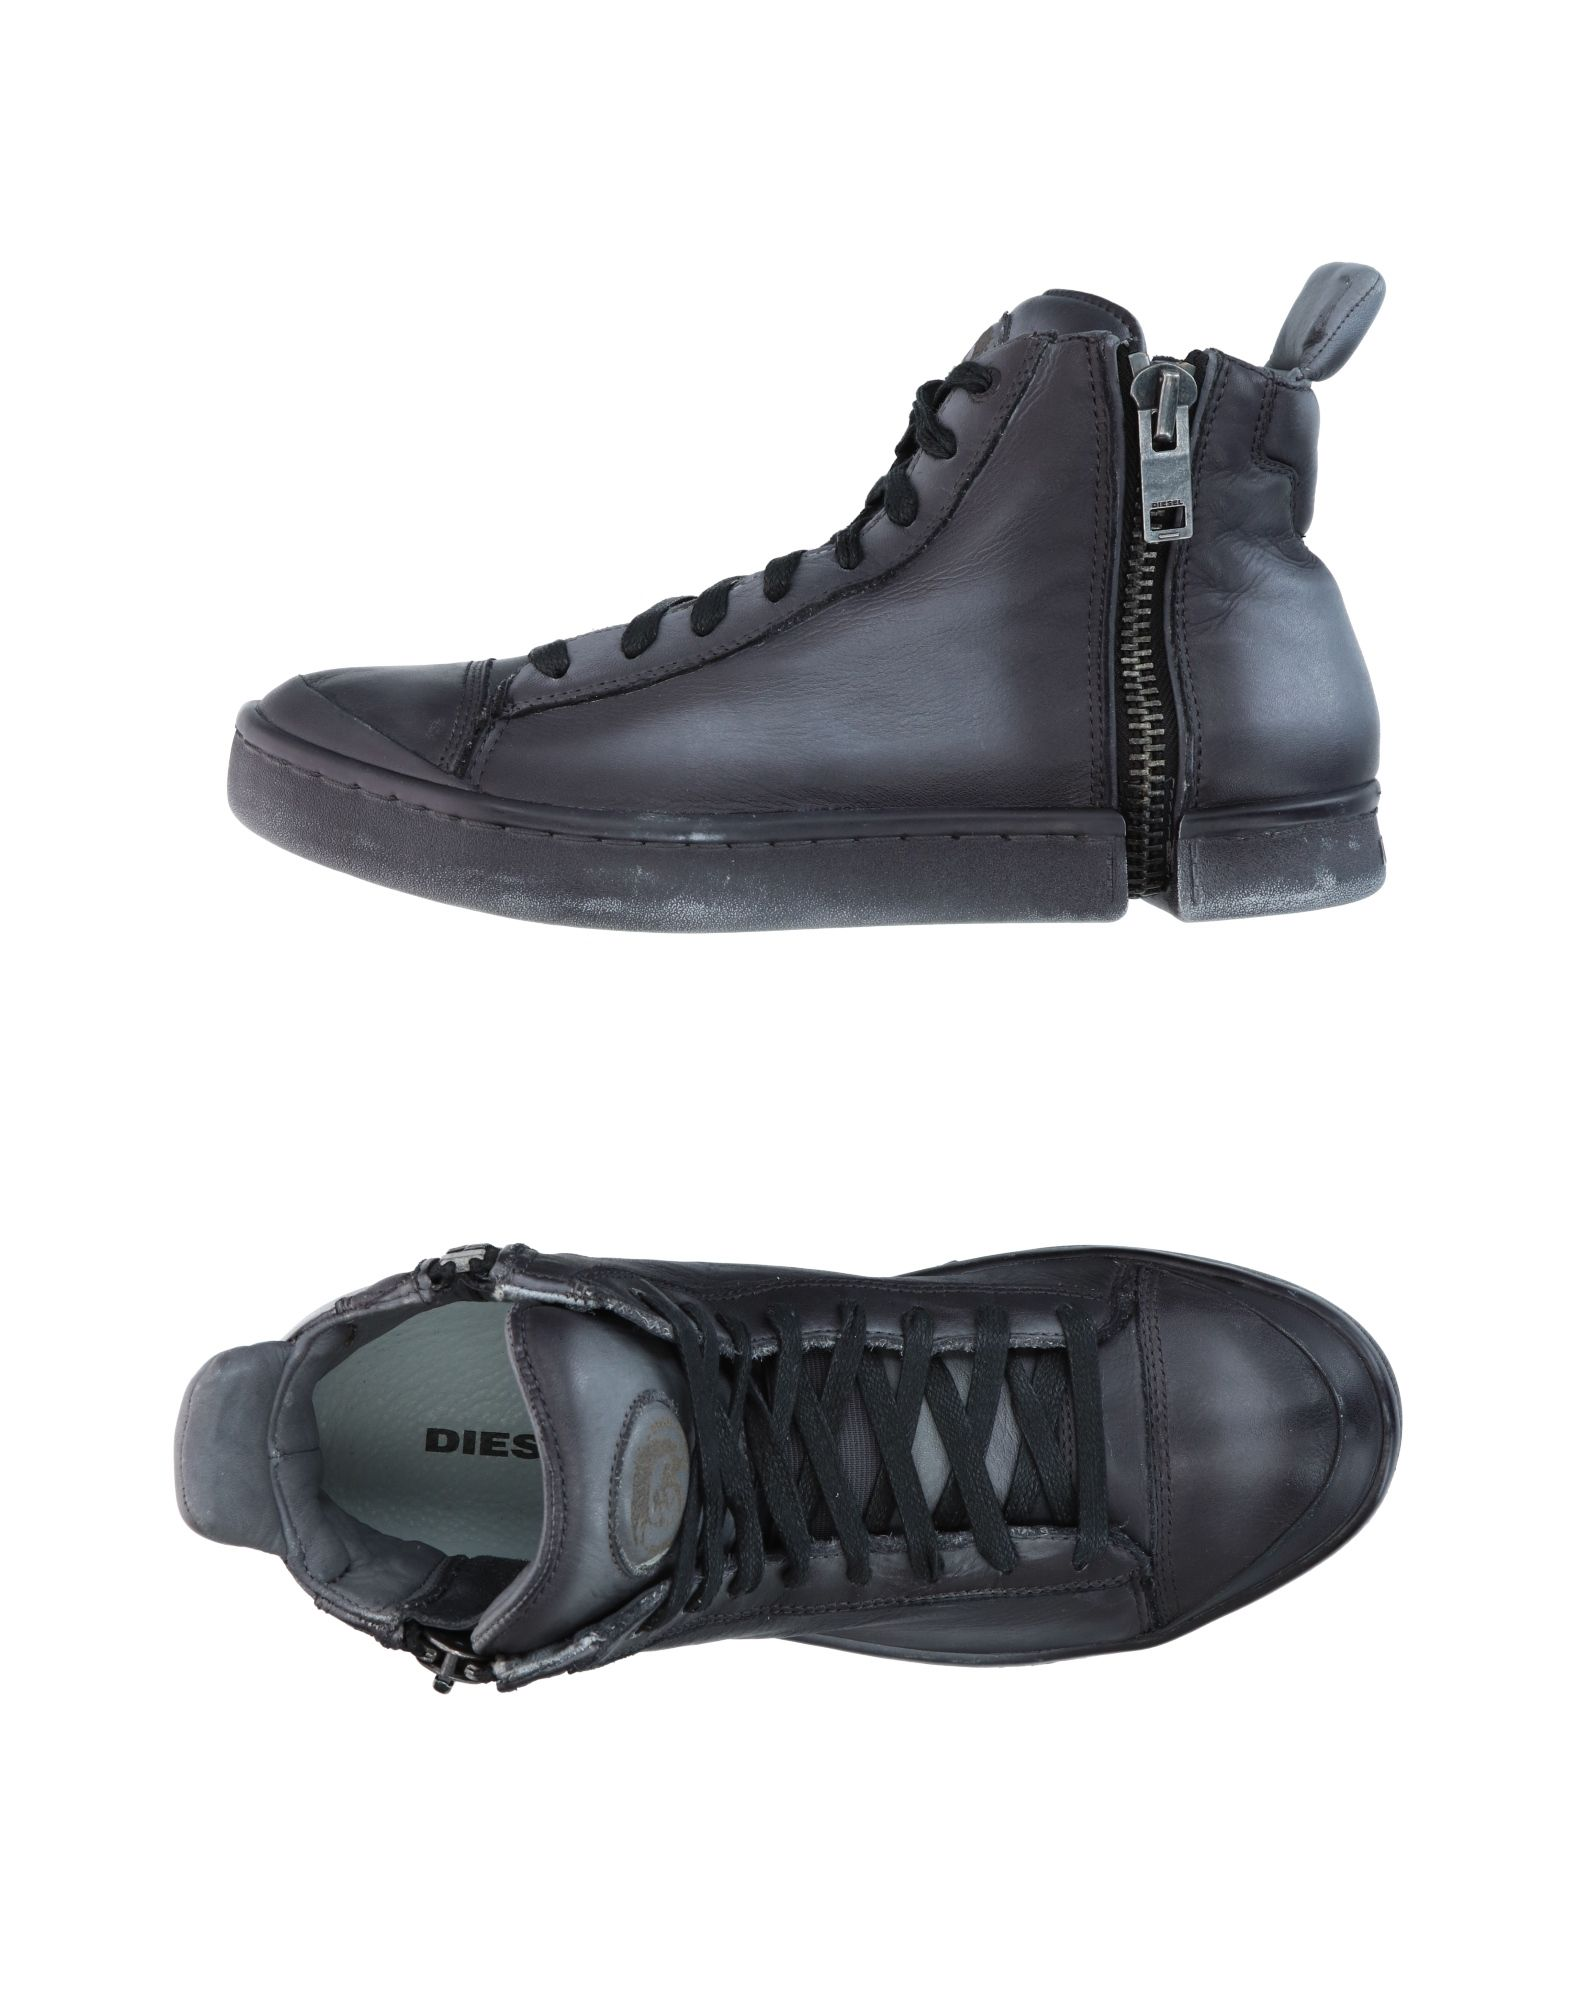 DIESEL Высокие кеды и кроссовки кеды кроссовки высокие dc council mid tx stone camo